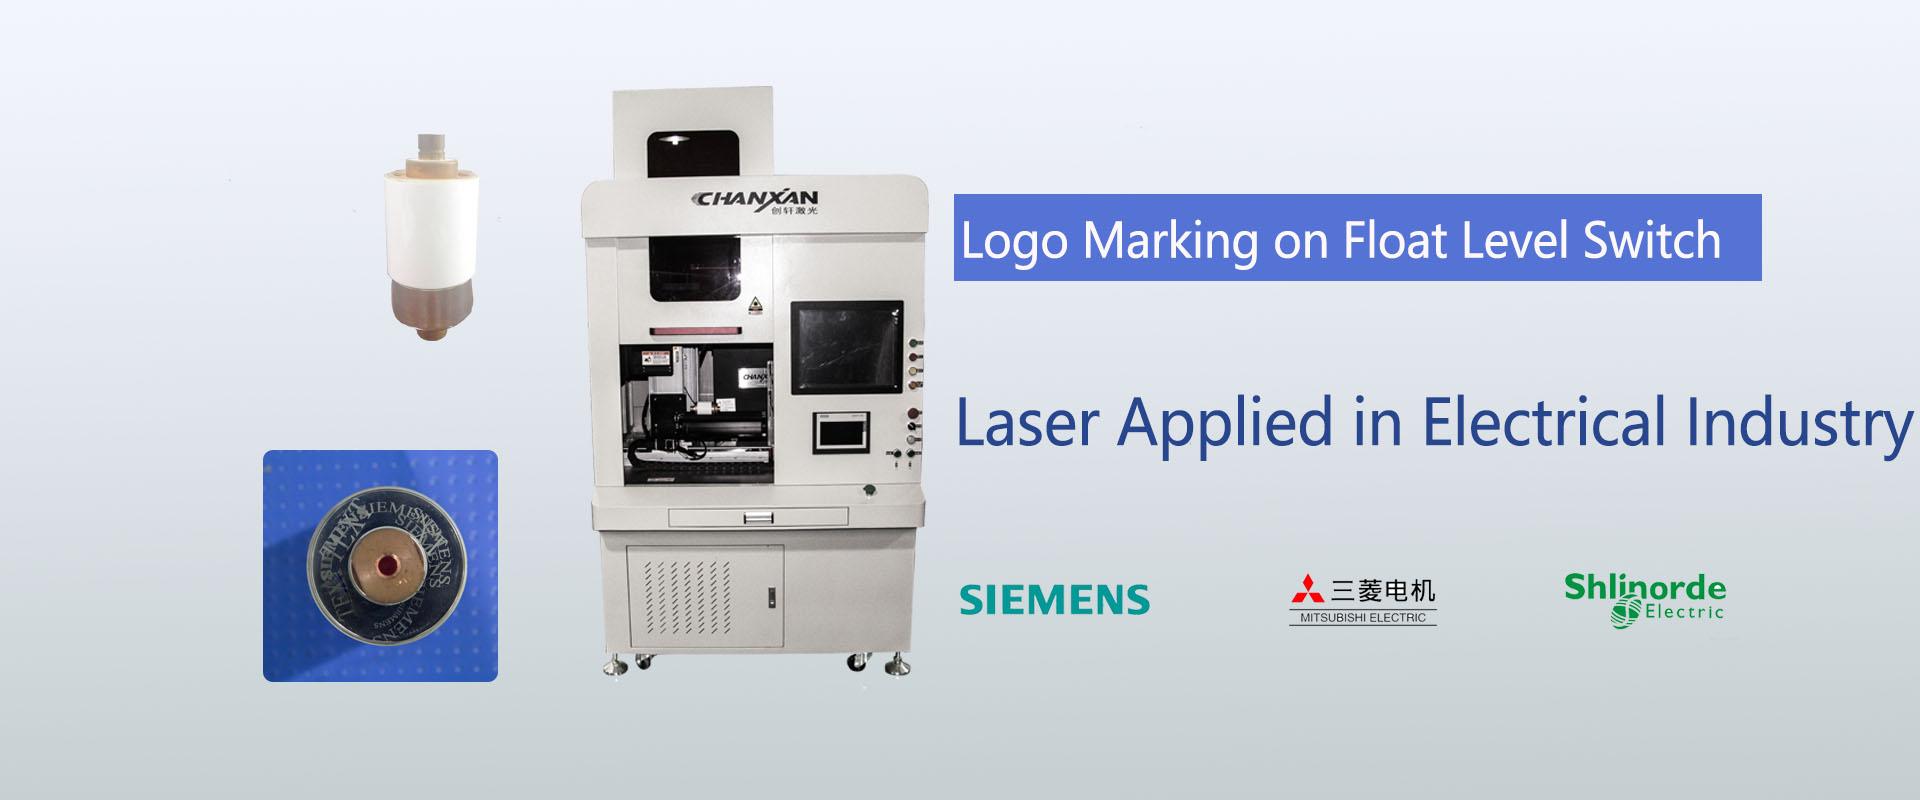 laser marking on switch